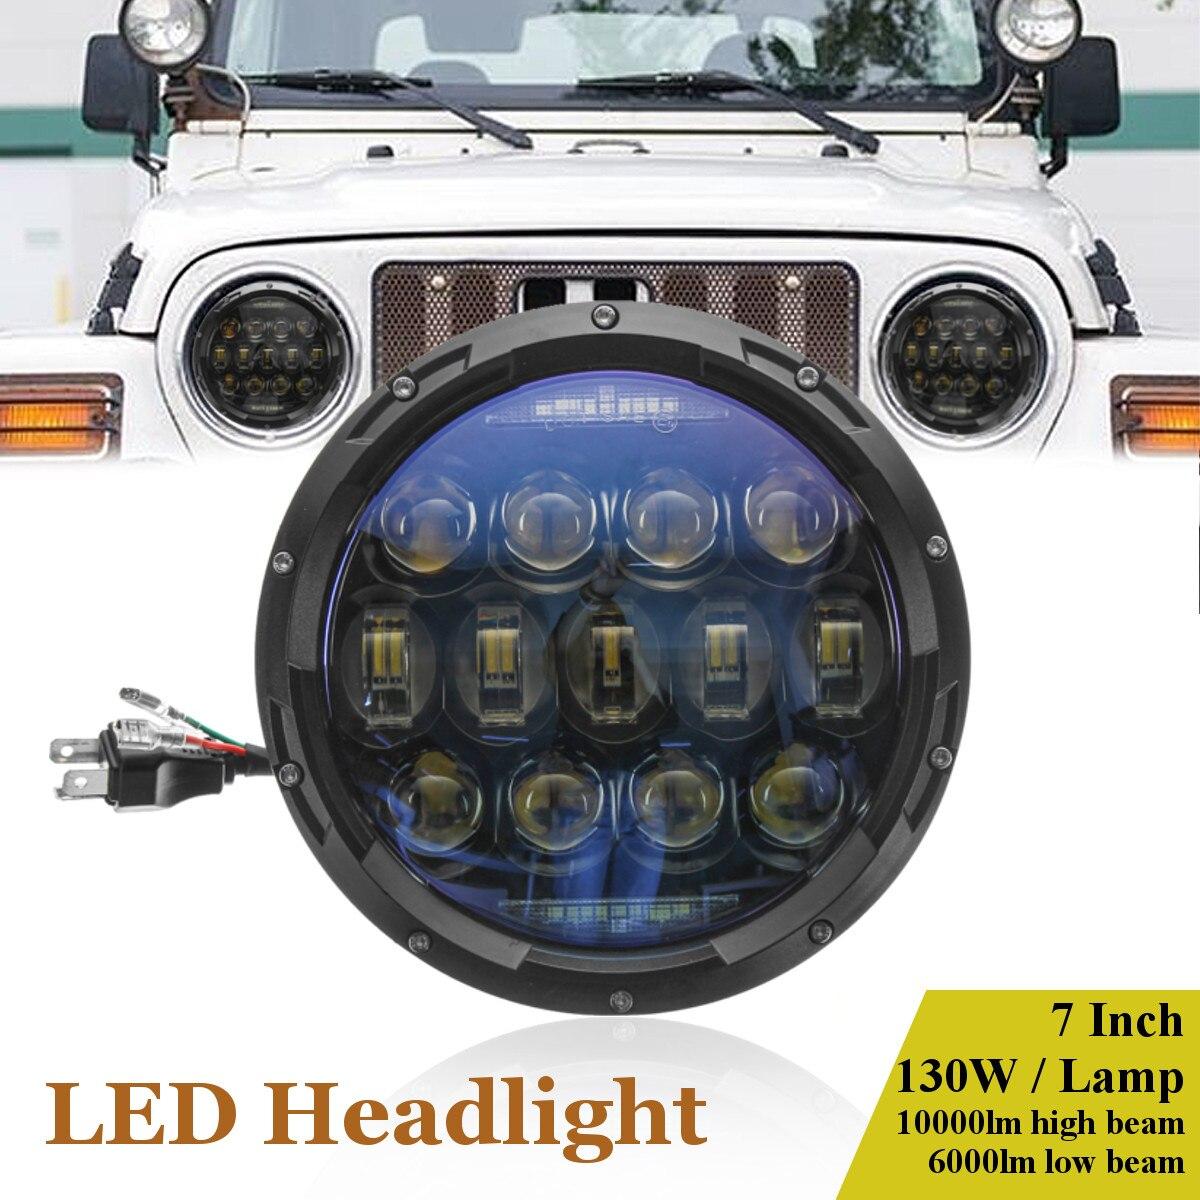 7 Inch IP69 Round 26-LED 150W Headlight Lamp Hi/Low Beam DRL for JEEP JK TJ LJ for Wrangler 1997-2015